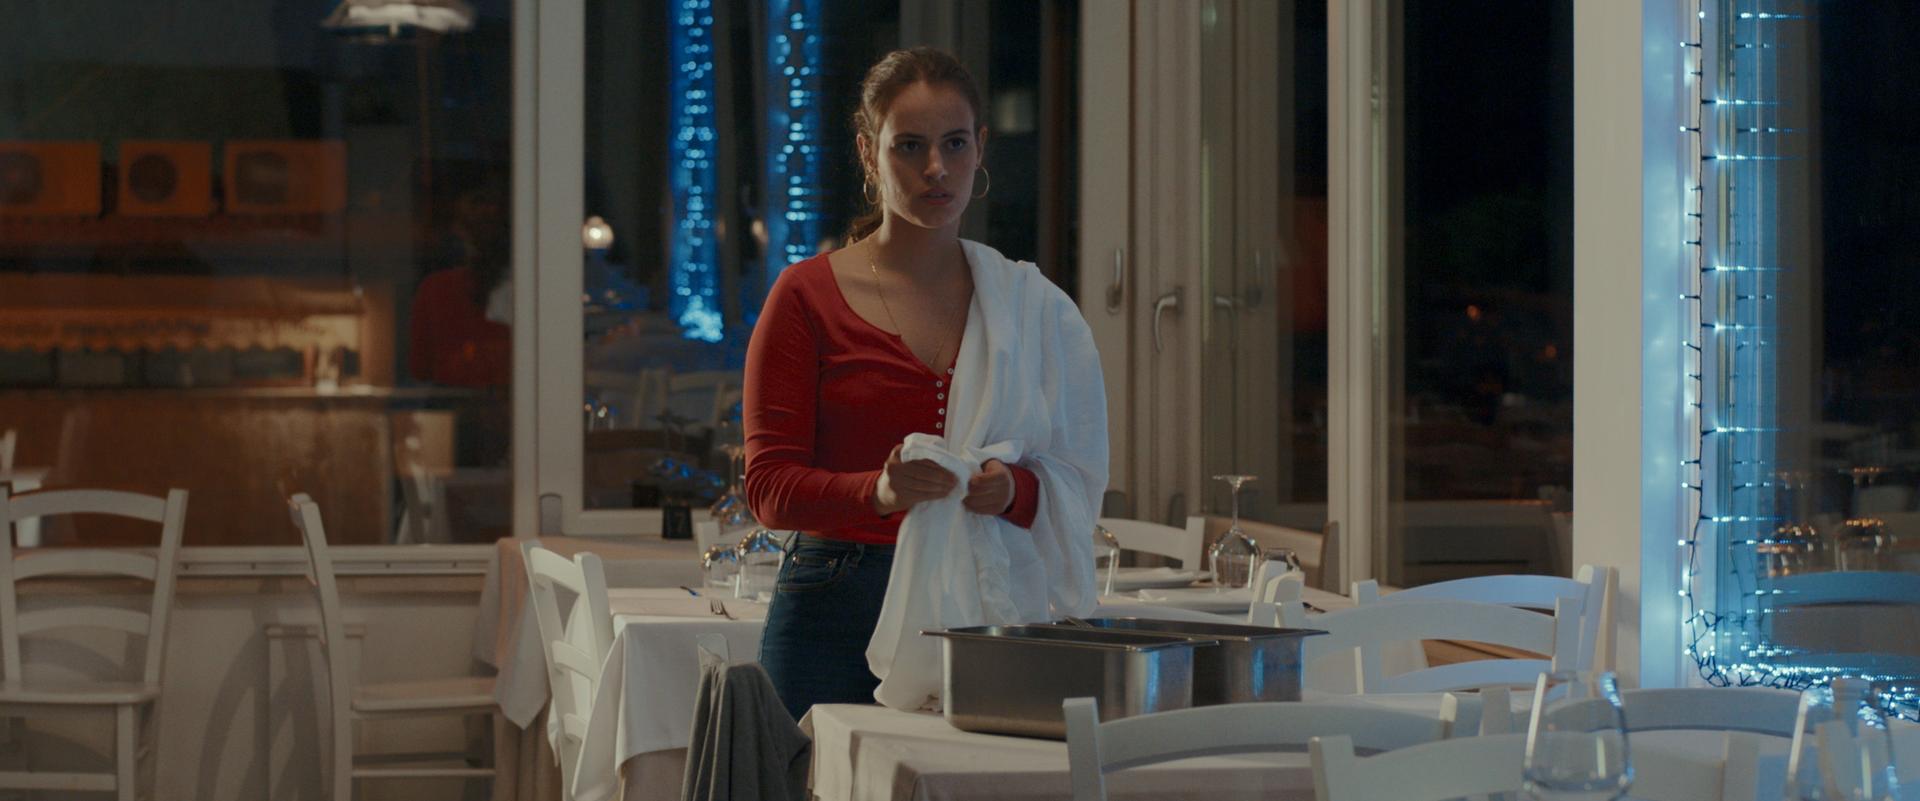 "Francesca Schirru, intervista alla regista di ""Di notte, sul mare"""